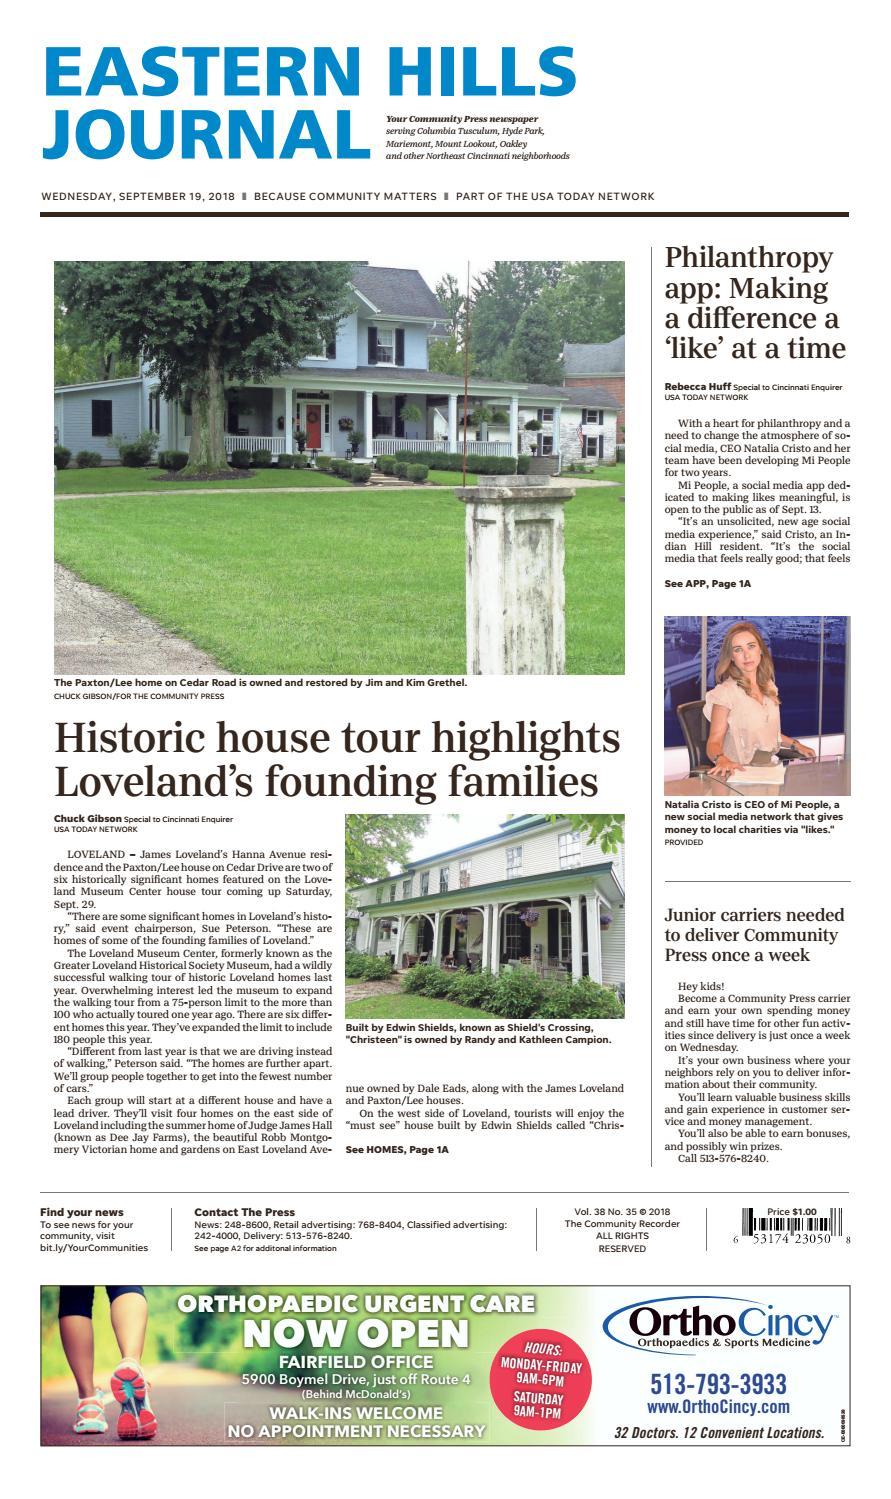 Eastern Hills Journal 09/19/18 by Enquirer Media - issuu